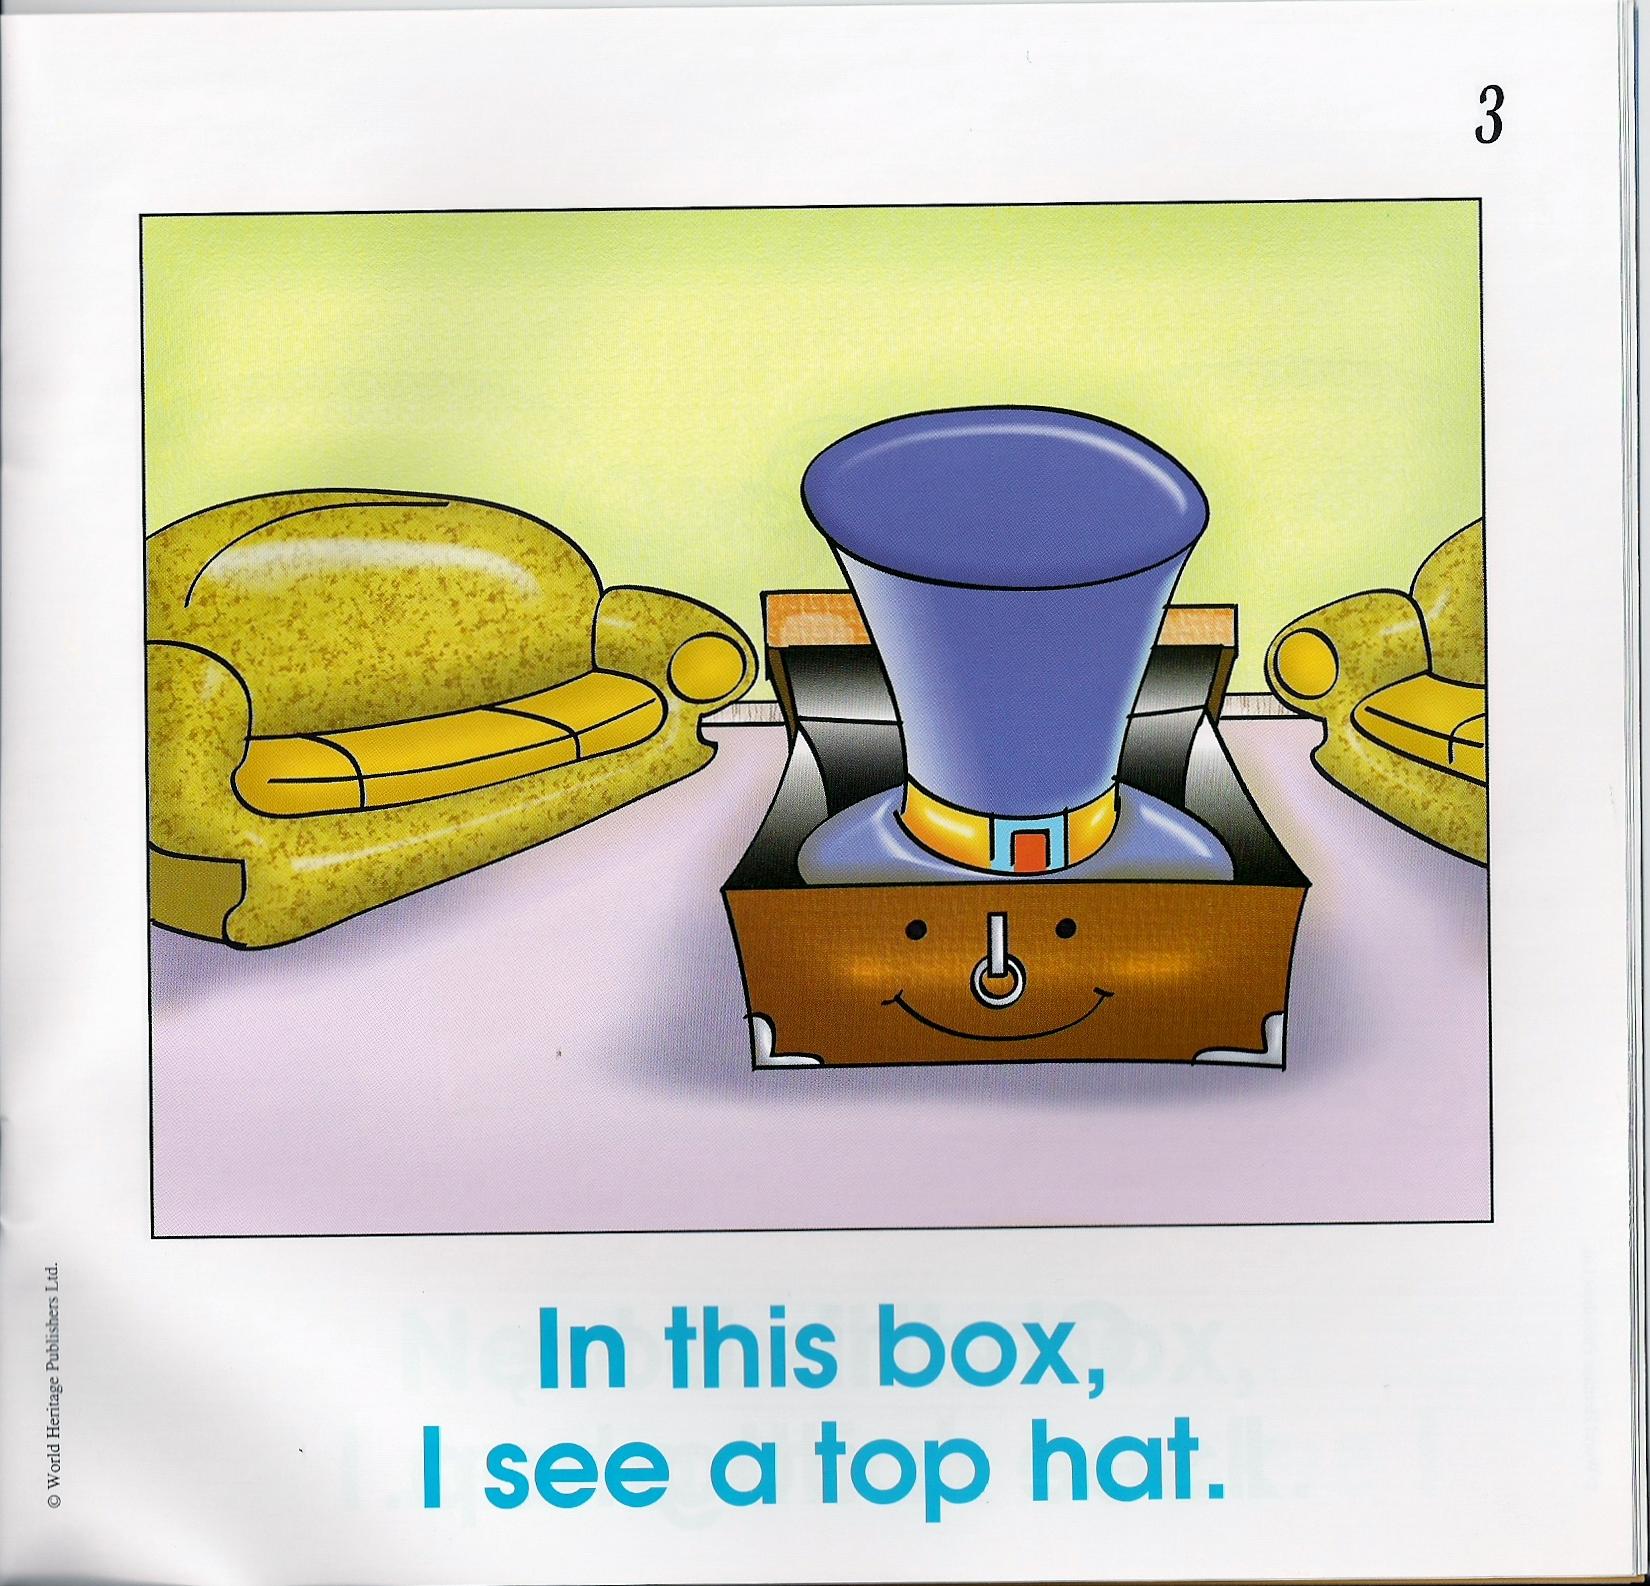 I See a Box page 3